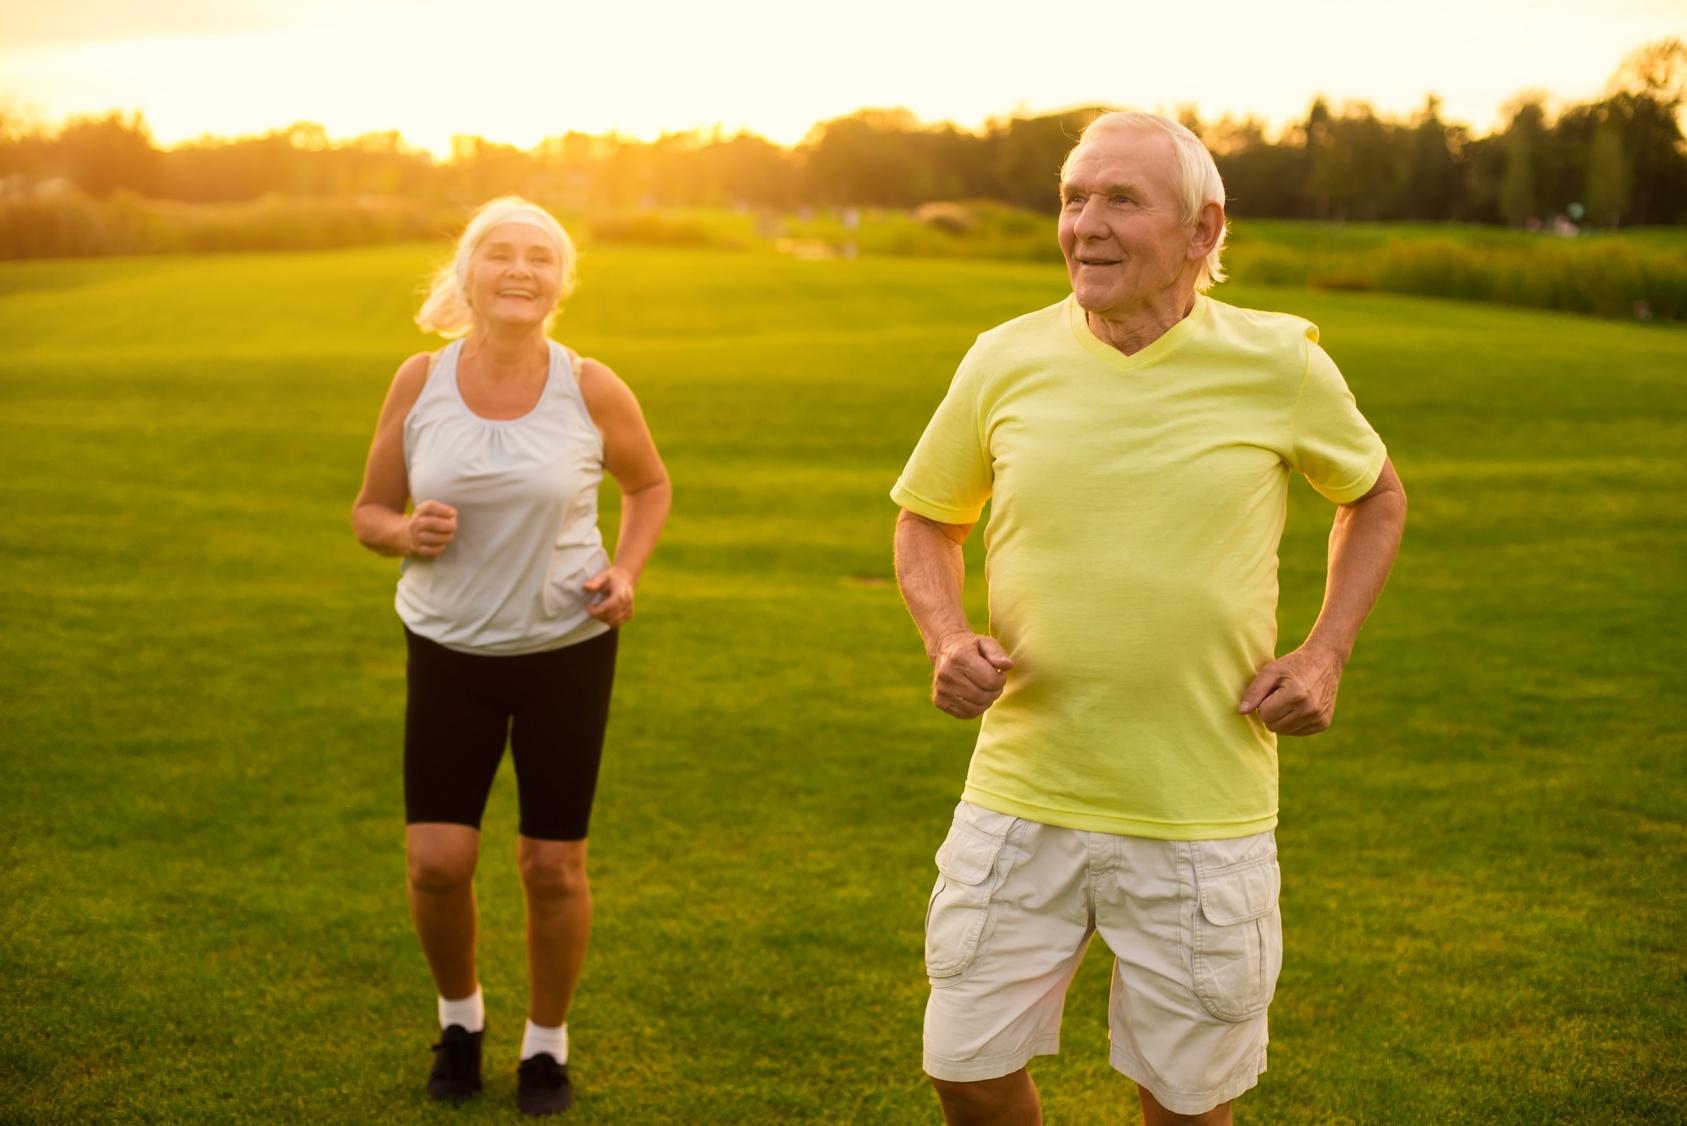 aging-senior-couple-active.jpg